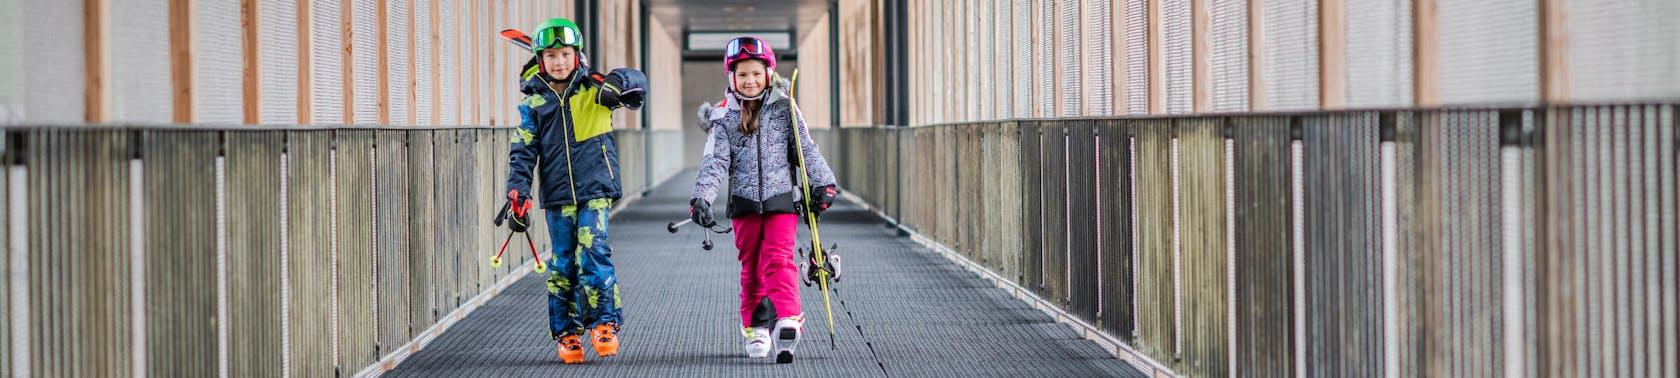 Skibekleidung und Skiausrüstung Kinder